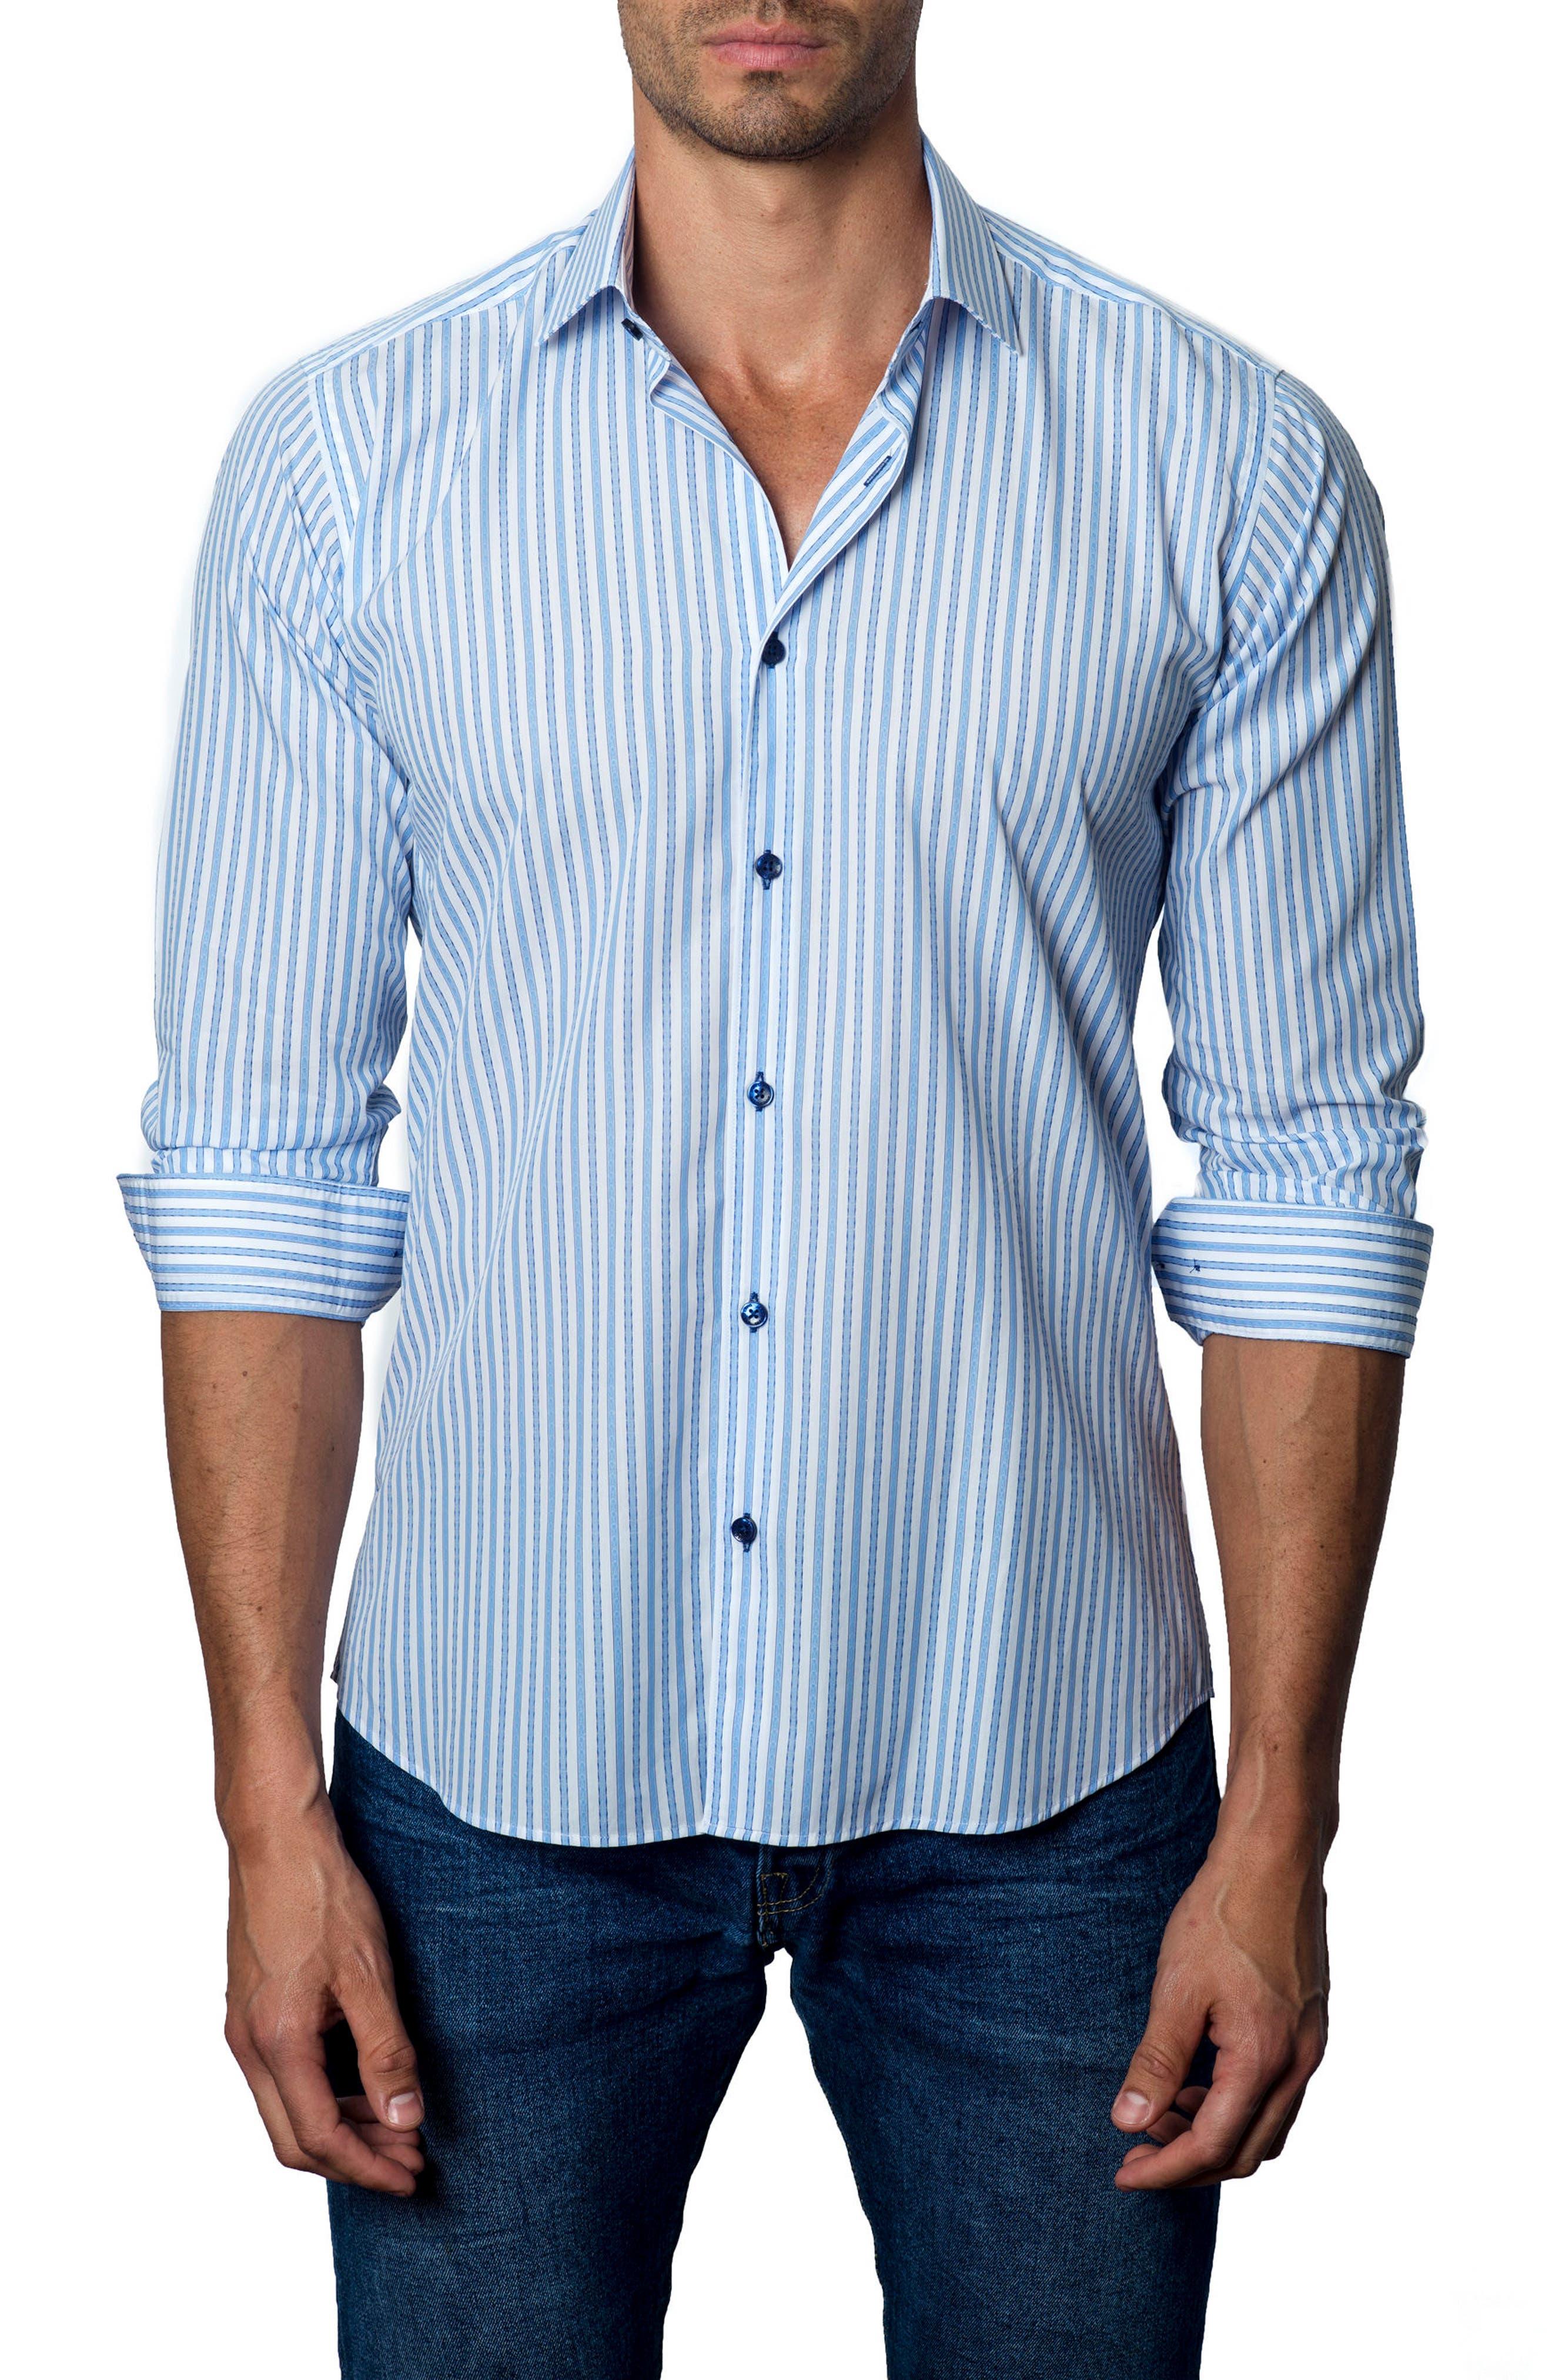 Trim Fit Stripe Sport Shirt,                             Main thumbnail 1, color,                             Light Blue / White Stripe